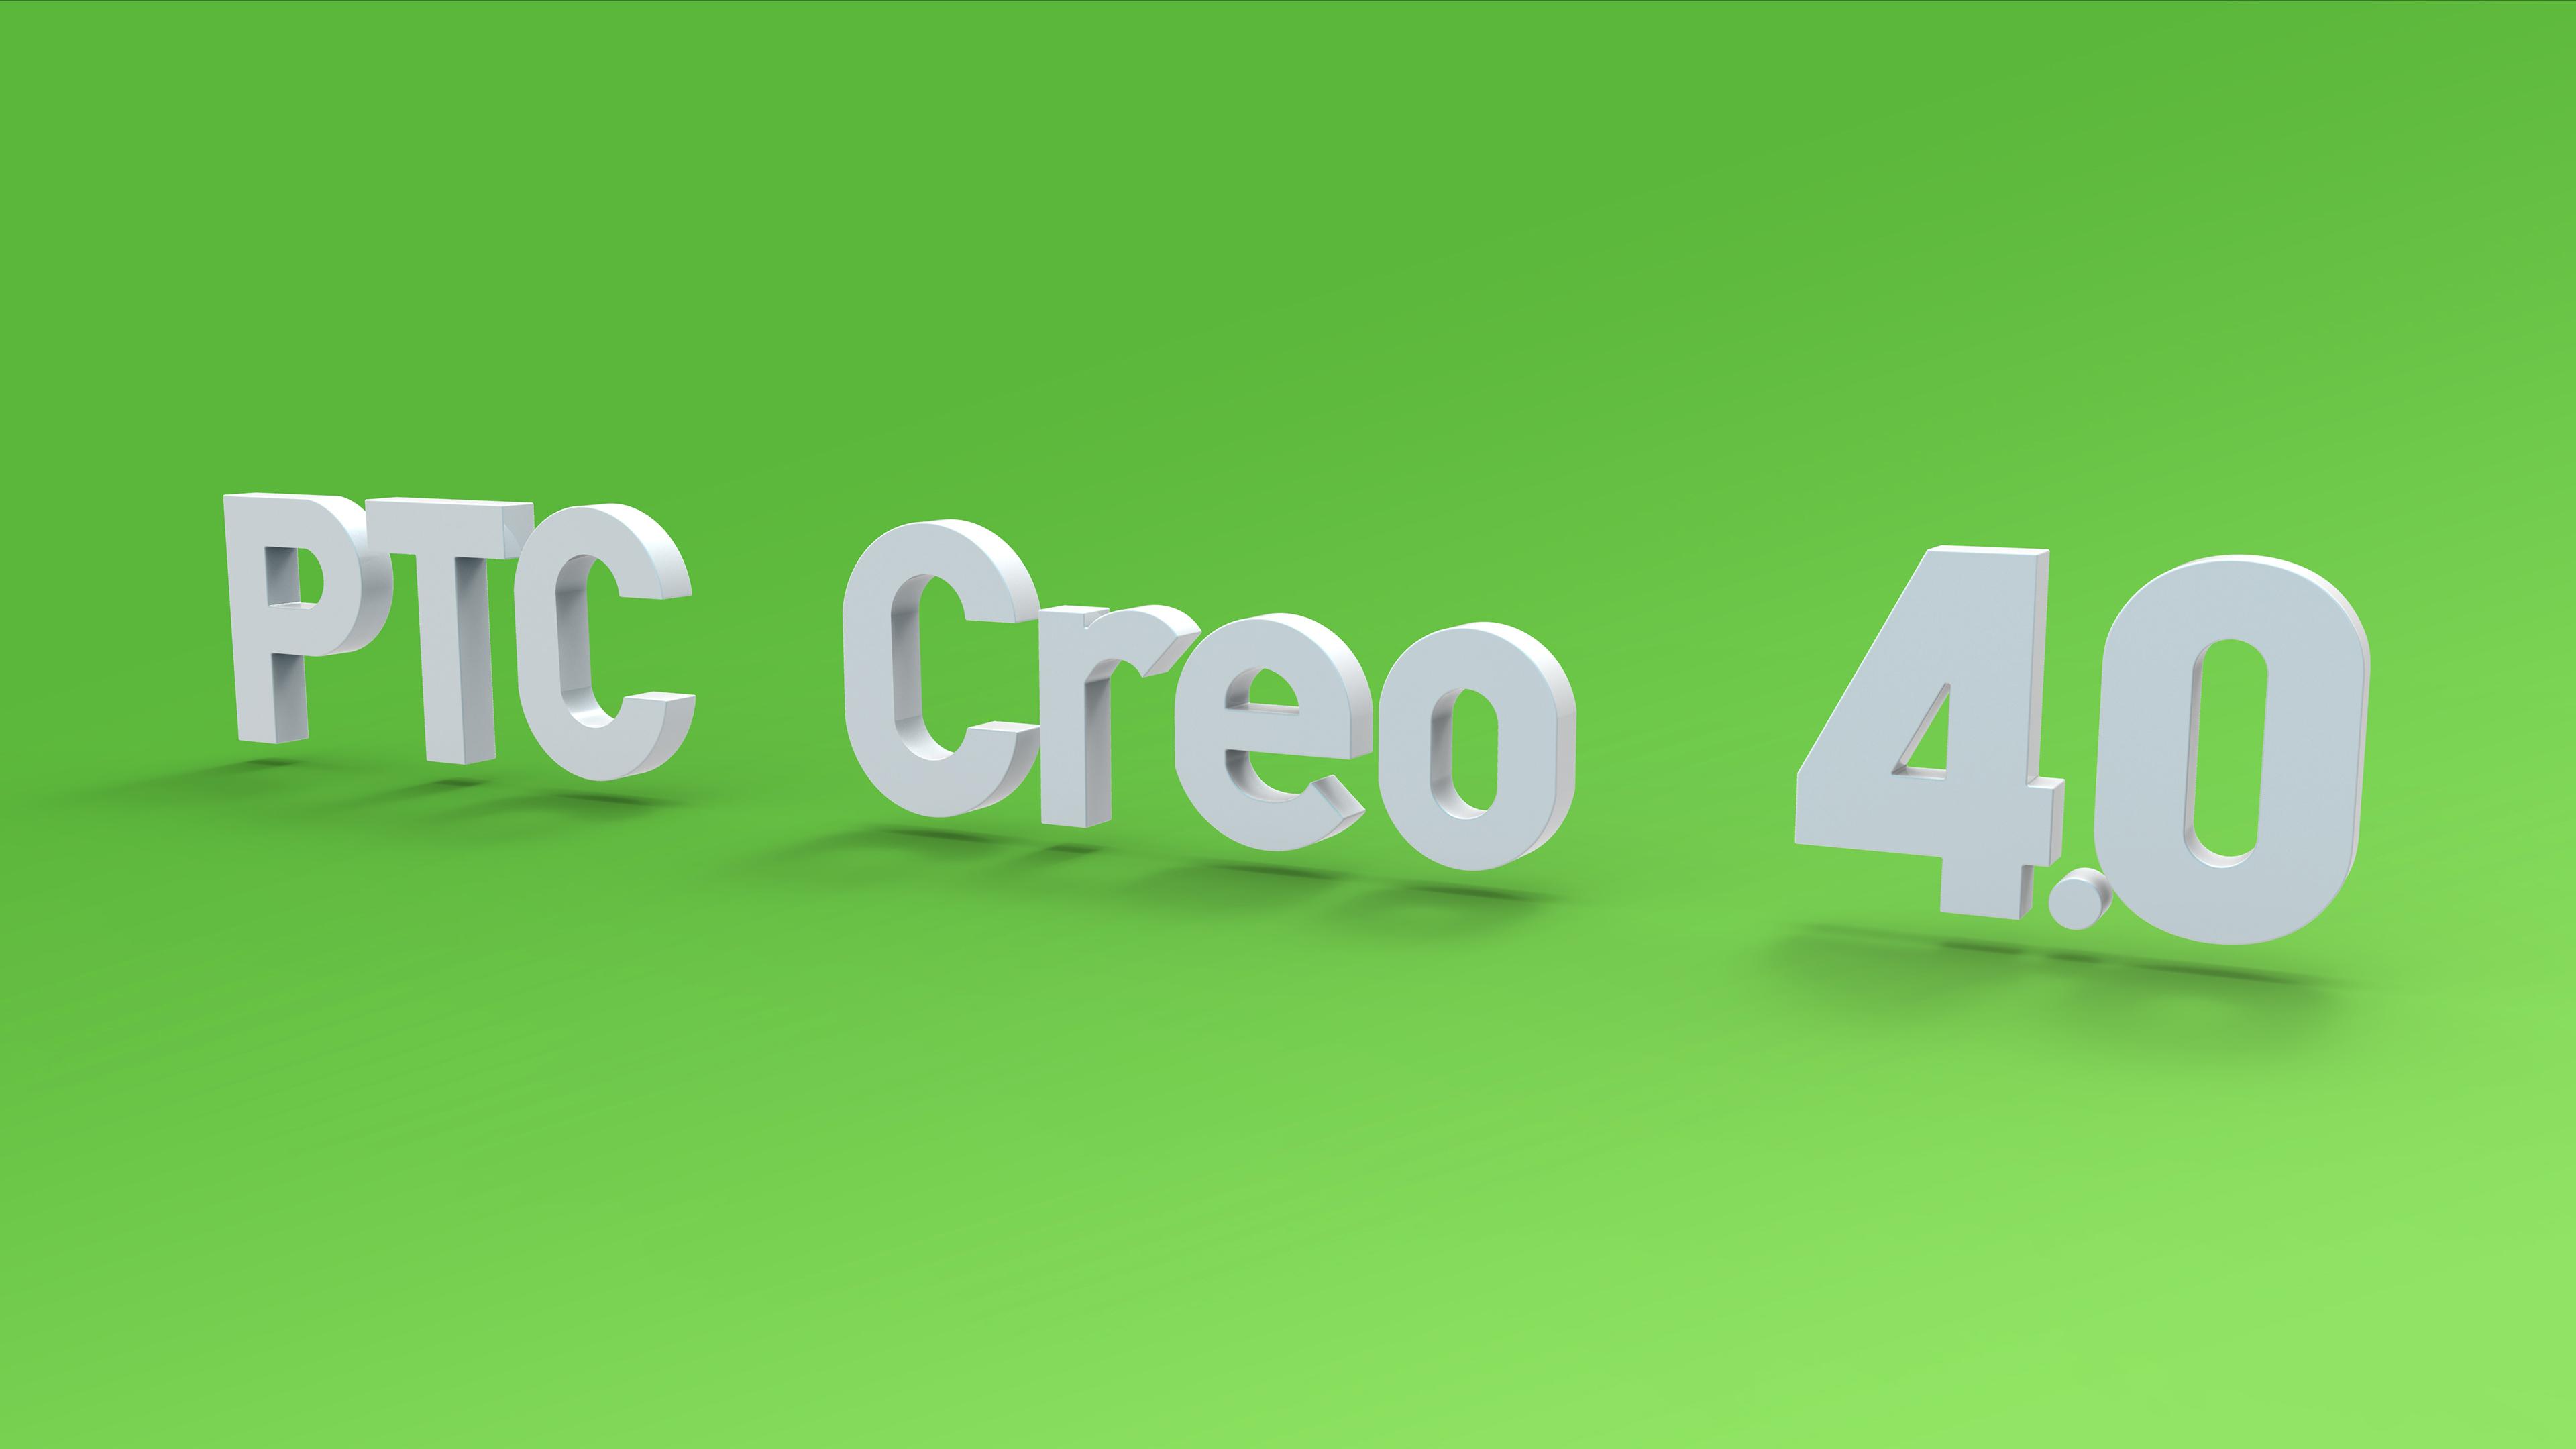 creo_4.jpg